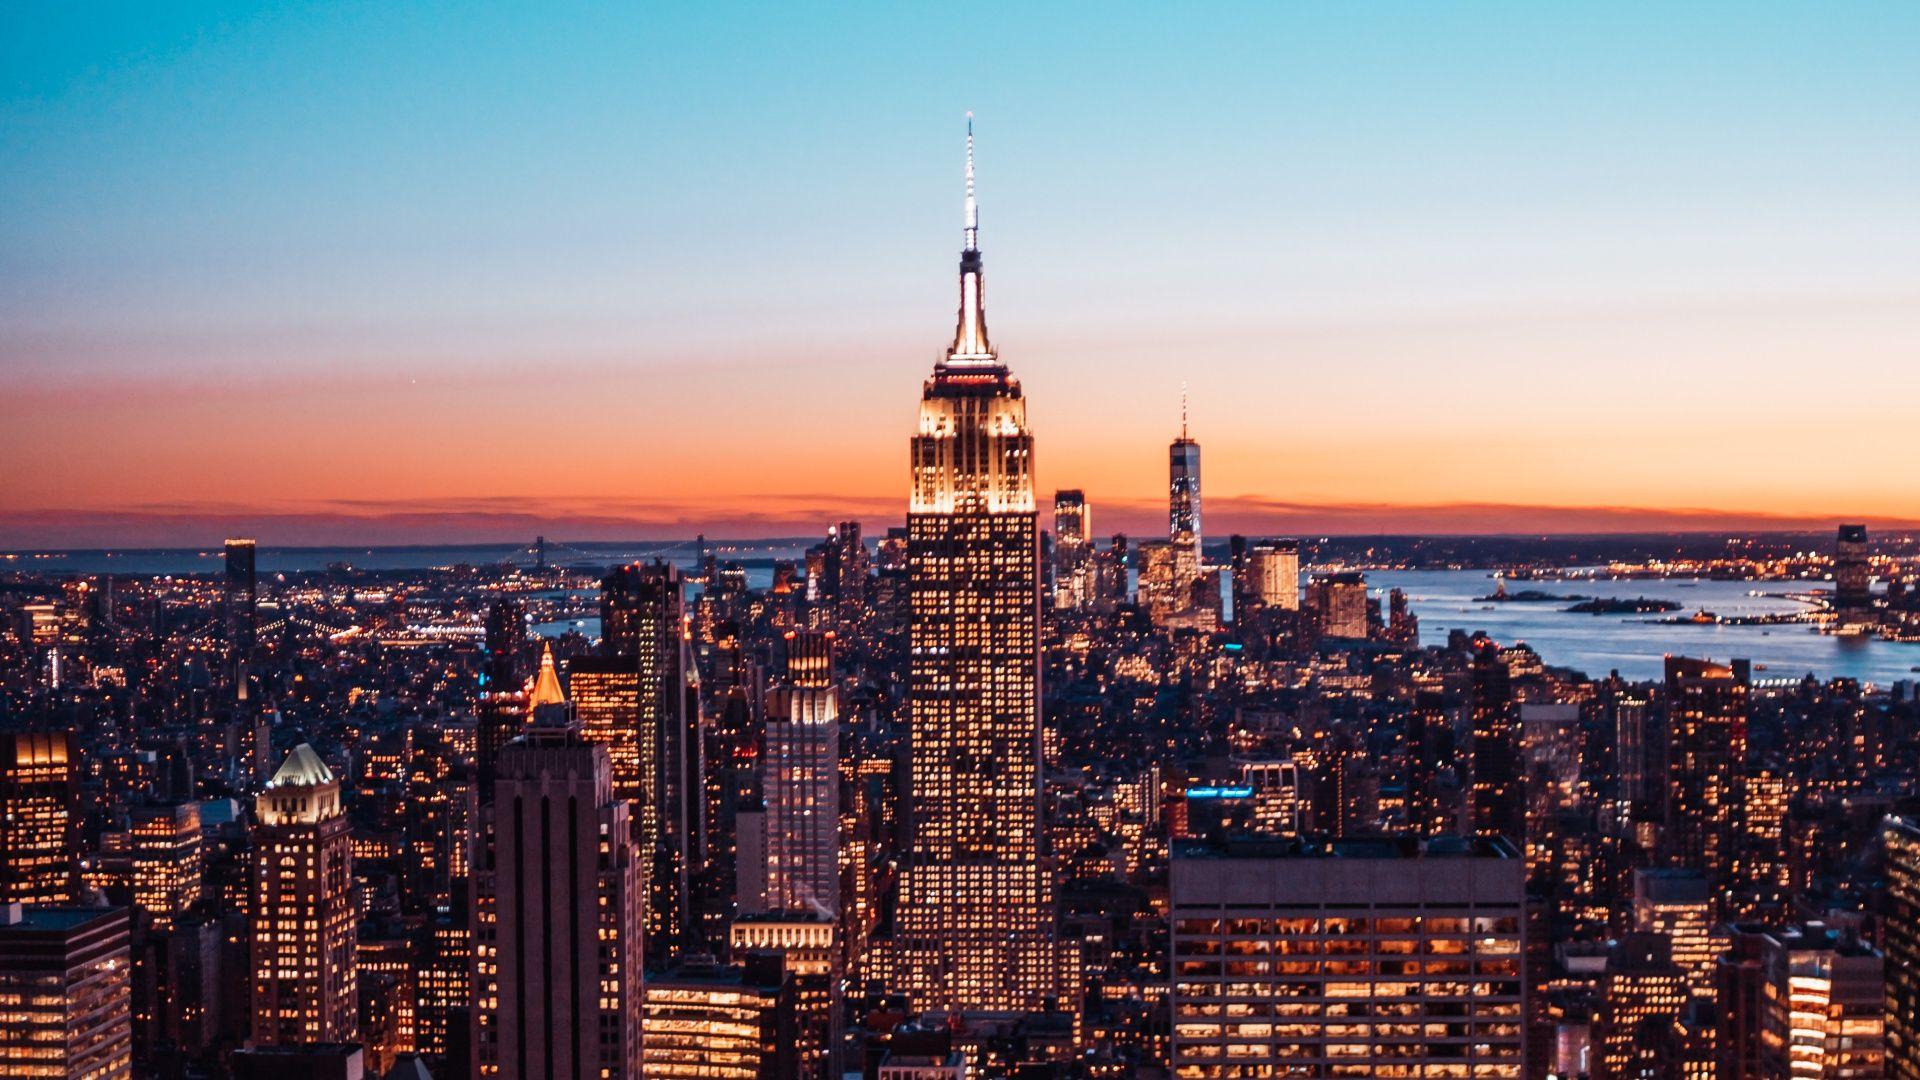 1920x1080 New York Cityscape Buildings Wallpaper In 2020 Cityscape New York Cityscape Building